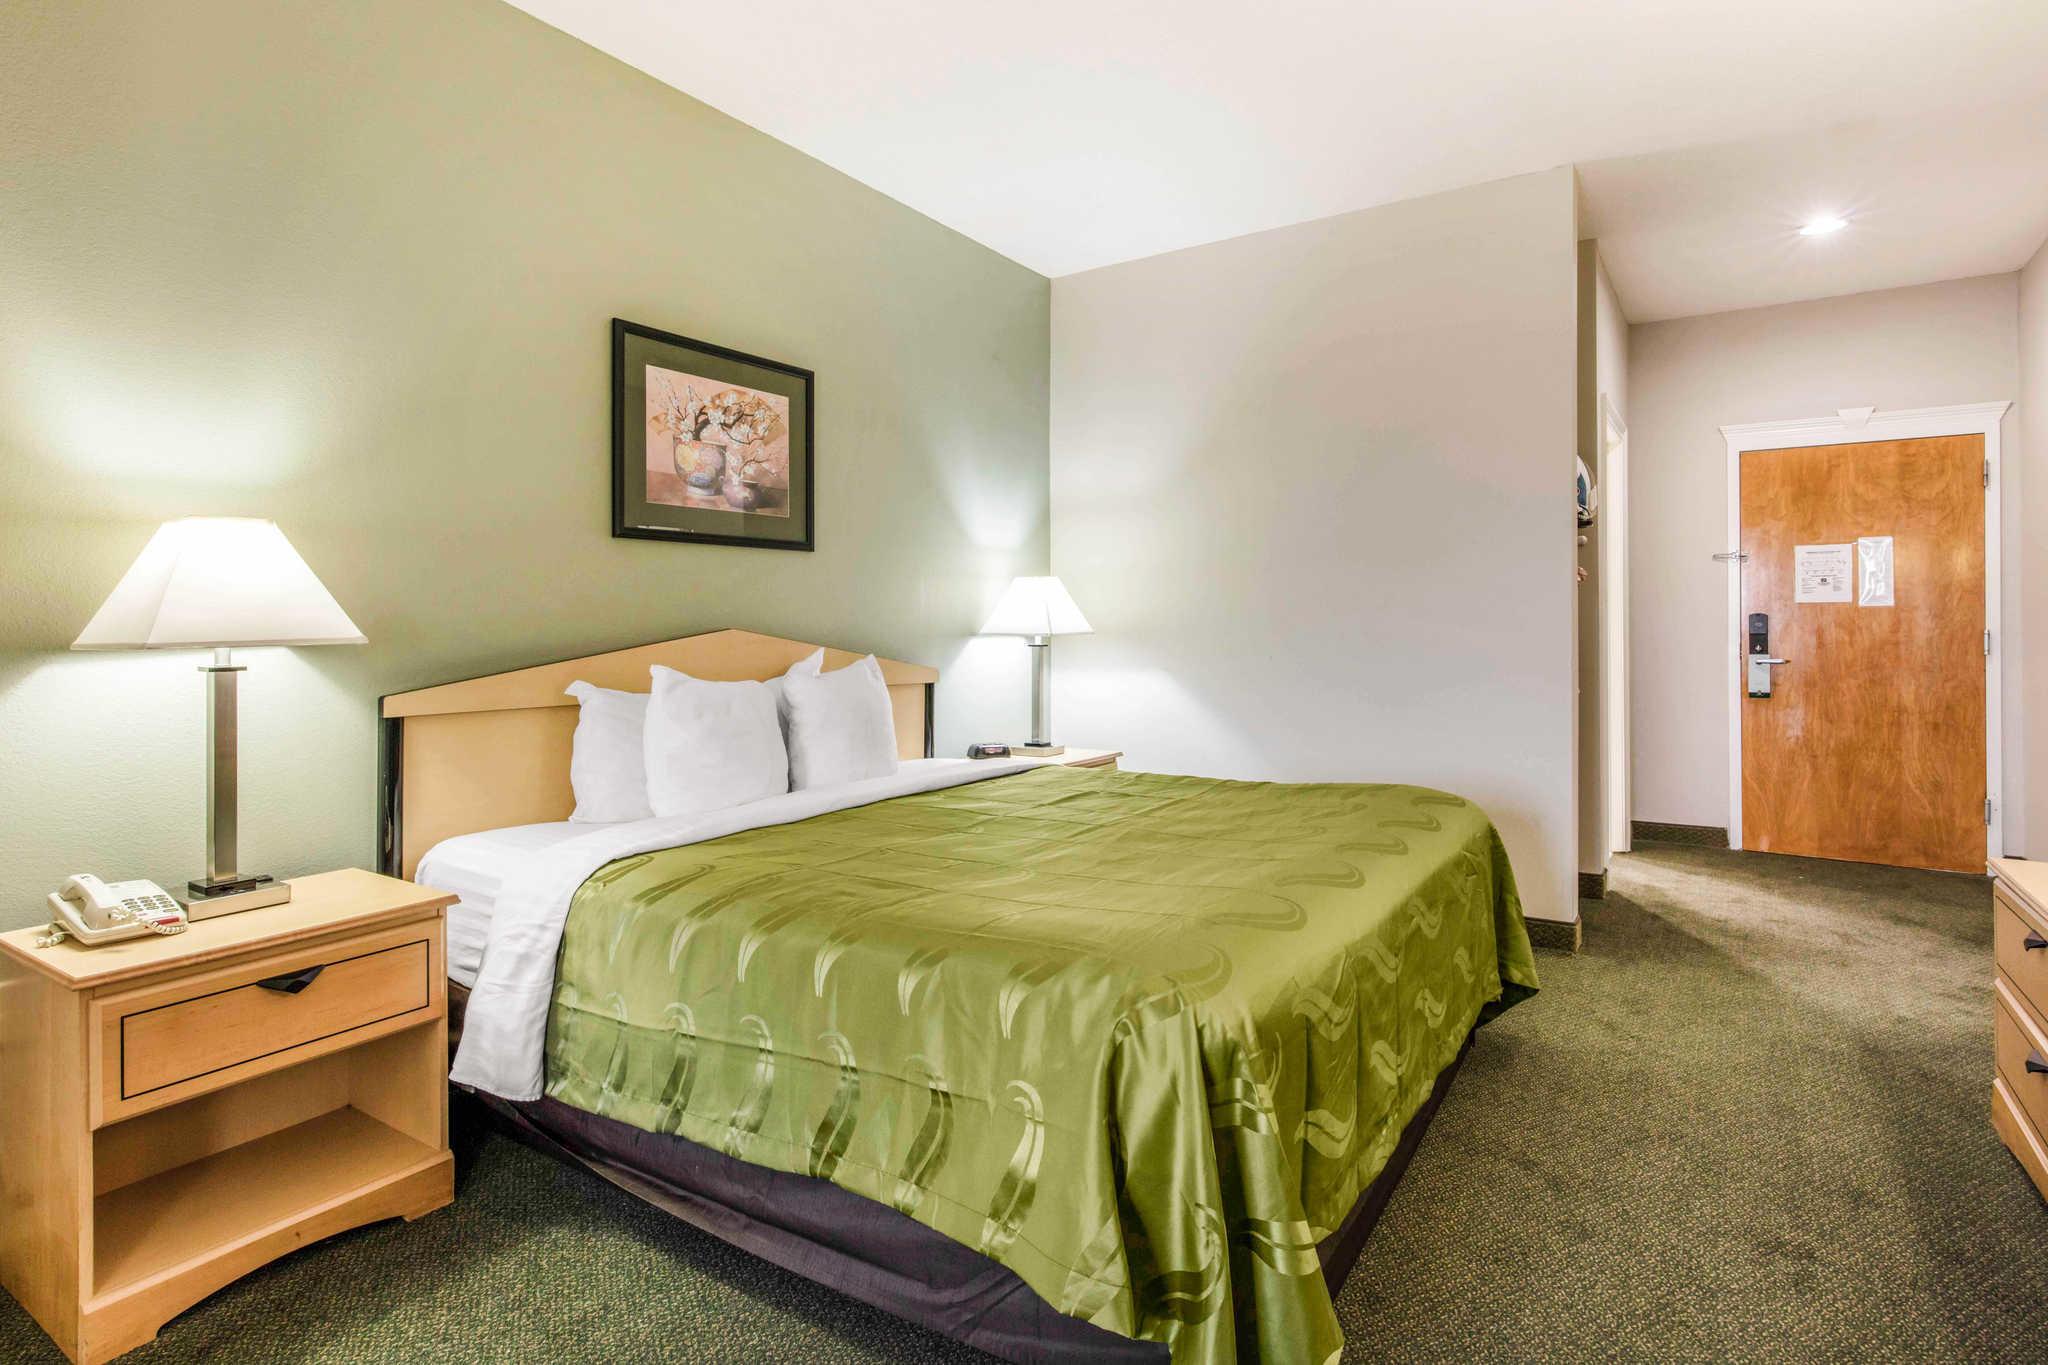 Holiday Inn Express & Suites Jackson - Flowood Hotel by IHG